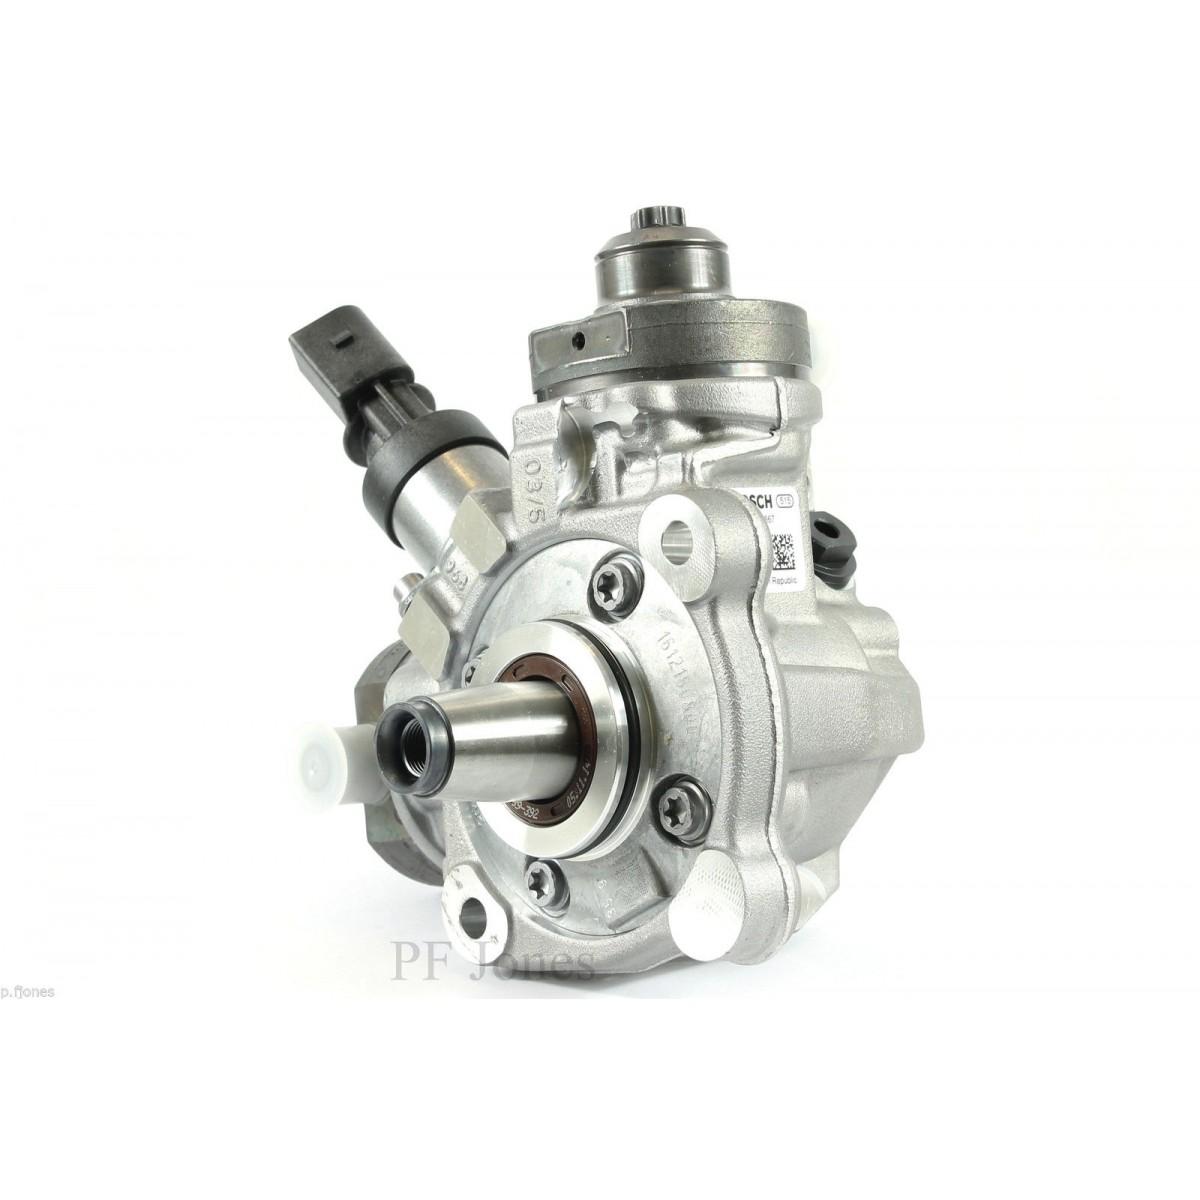 Bomba Injetora Diesel De Alta Pressao Bmw X3 e X5 3.0 6cc Apos 2013 - 0445010634